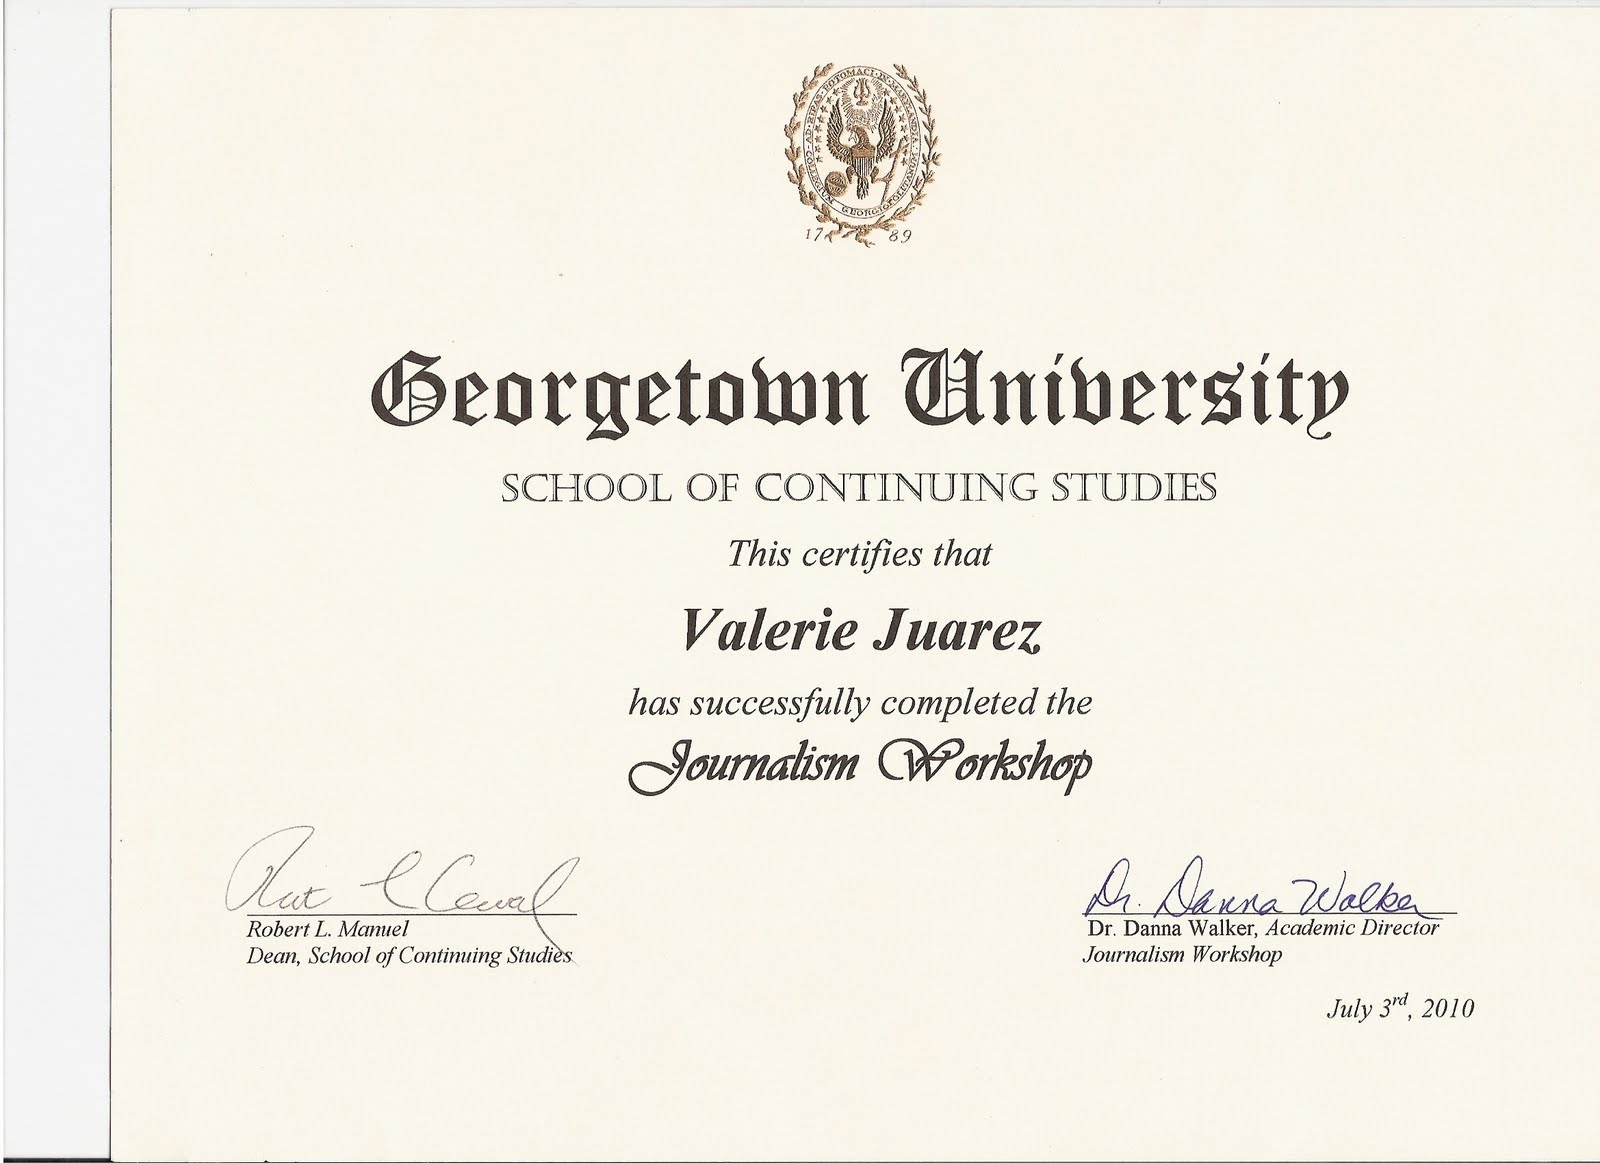 Broadcast Journalism Program At Georgetown University Summer 2010